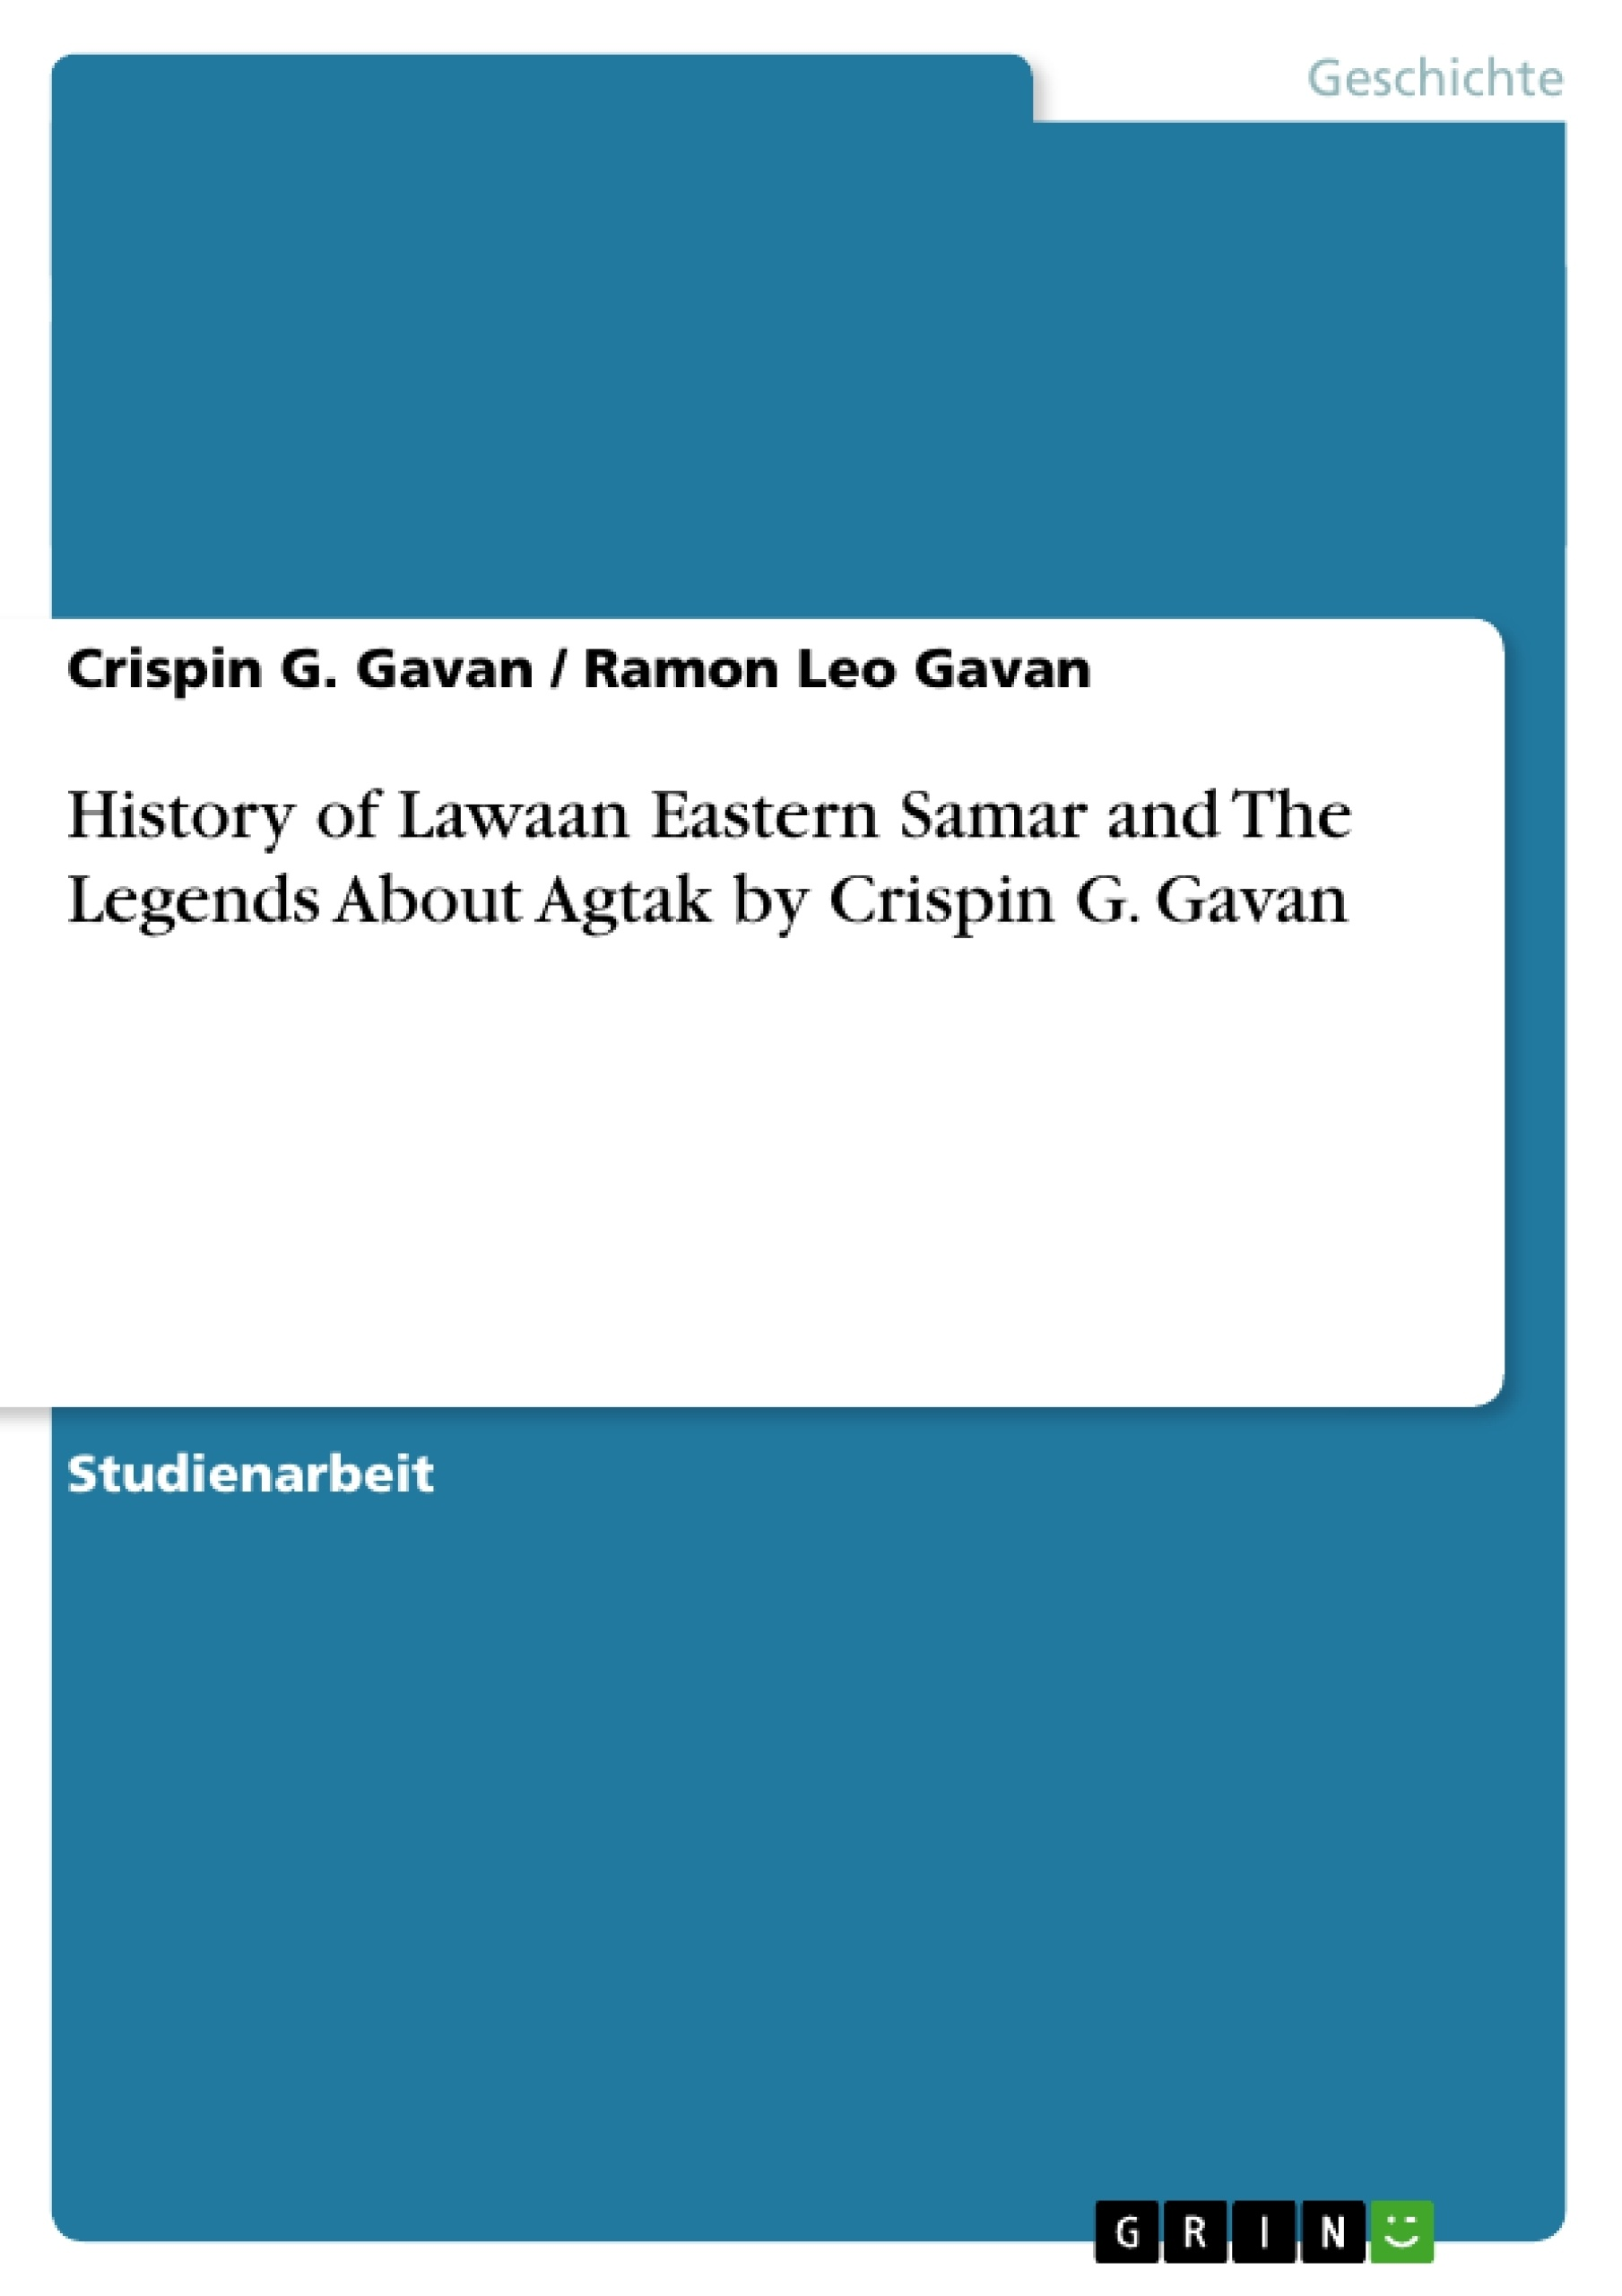 Titel: History of Lawaan Eastern Samar and The Legends About Agtak by Crispin G. Gavan